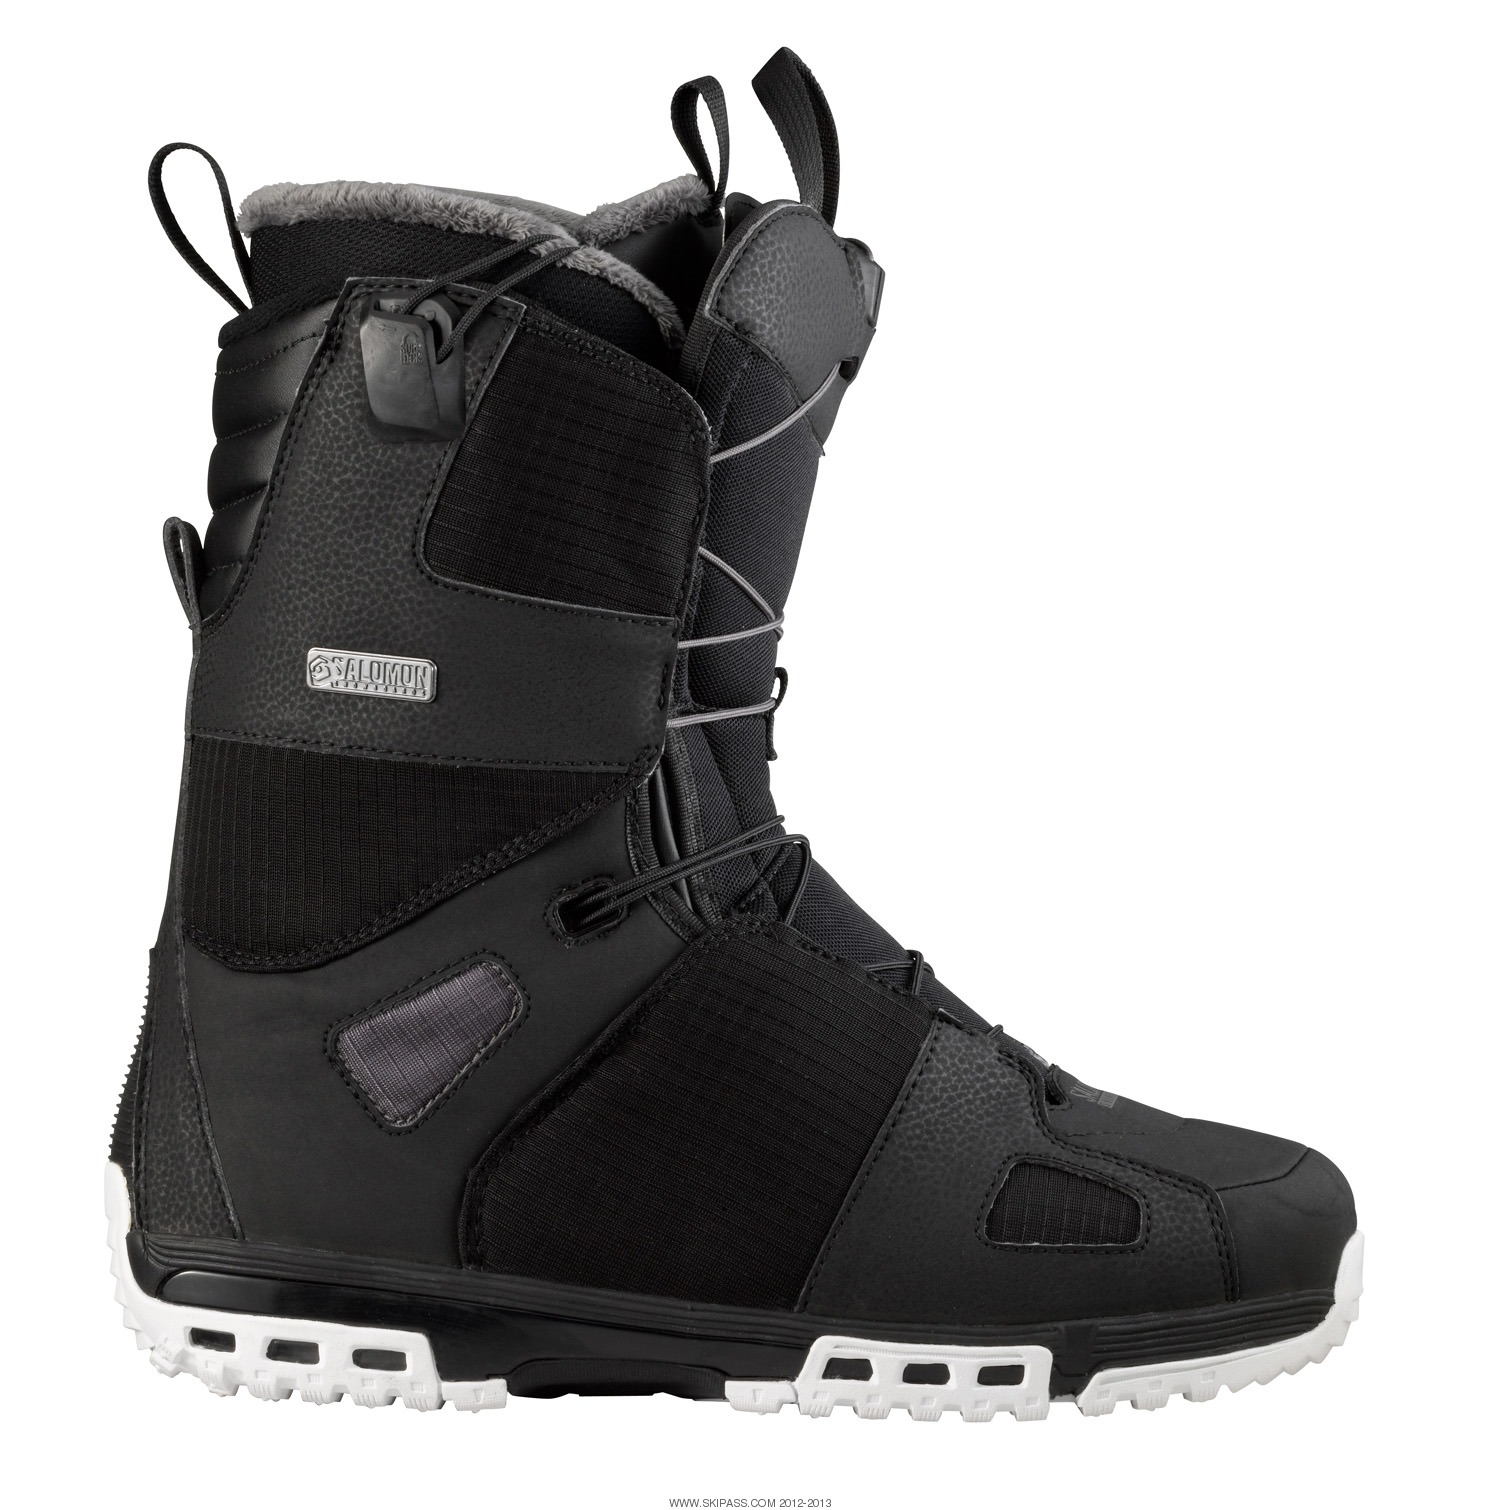 Salomon Homme Chaussure Snowboard 2013 XPikuTwOZ